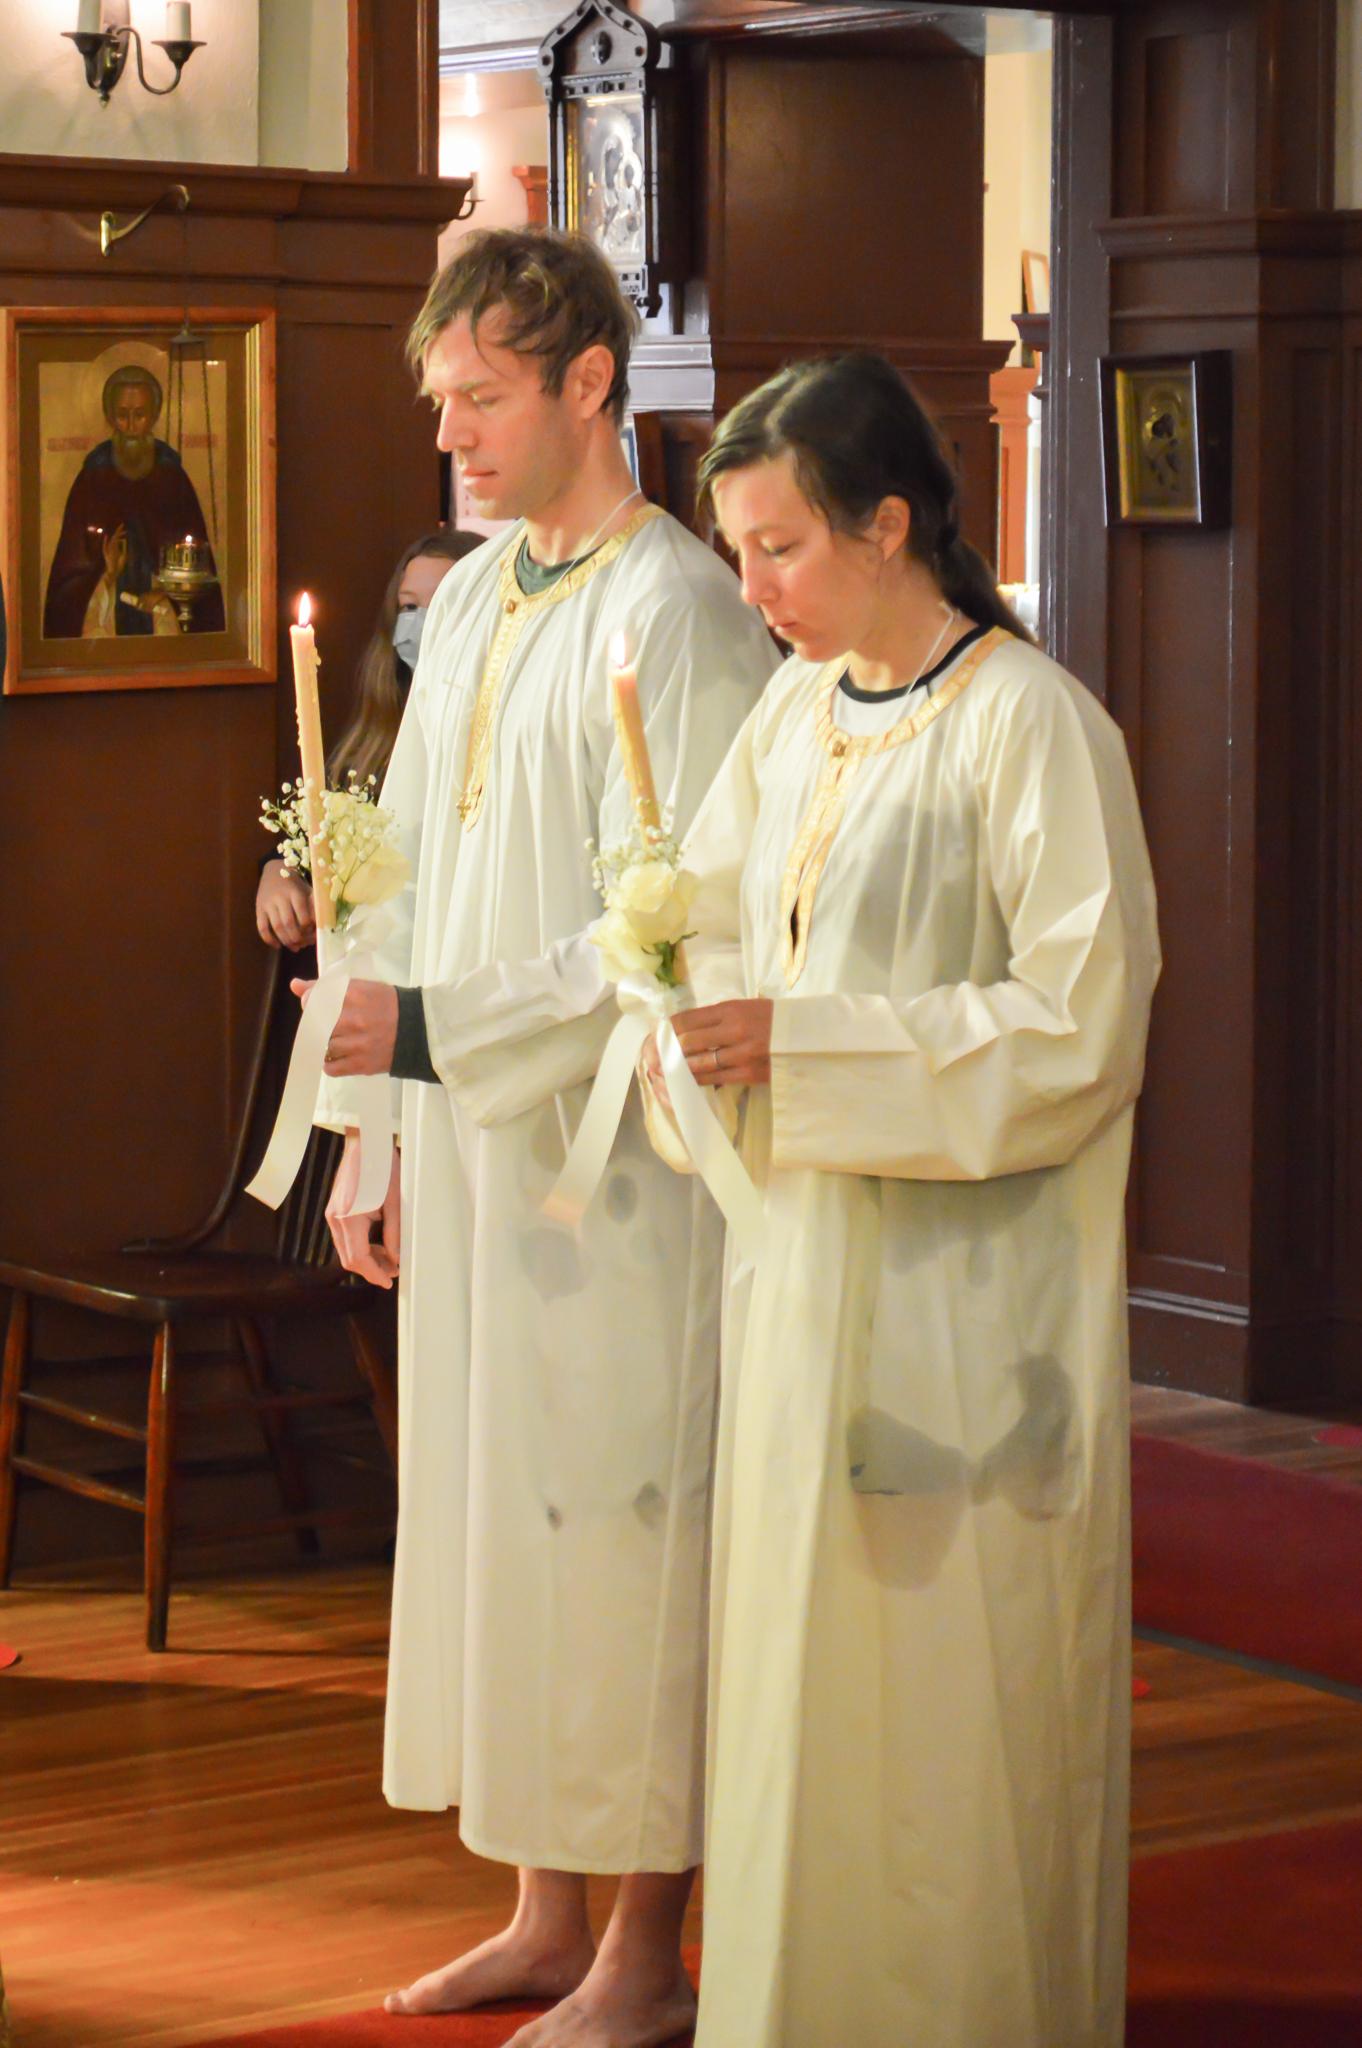 John-and-Alexandra-Baptism-Feb28-57